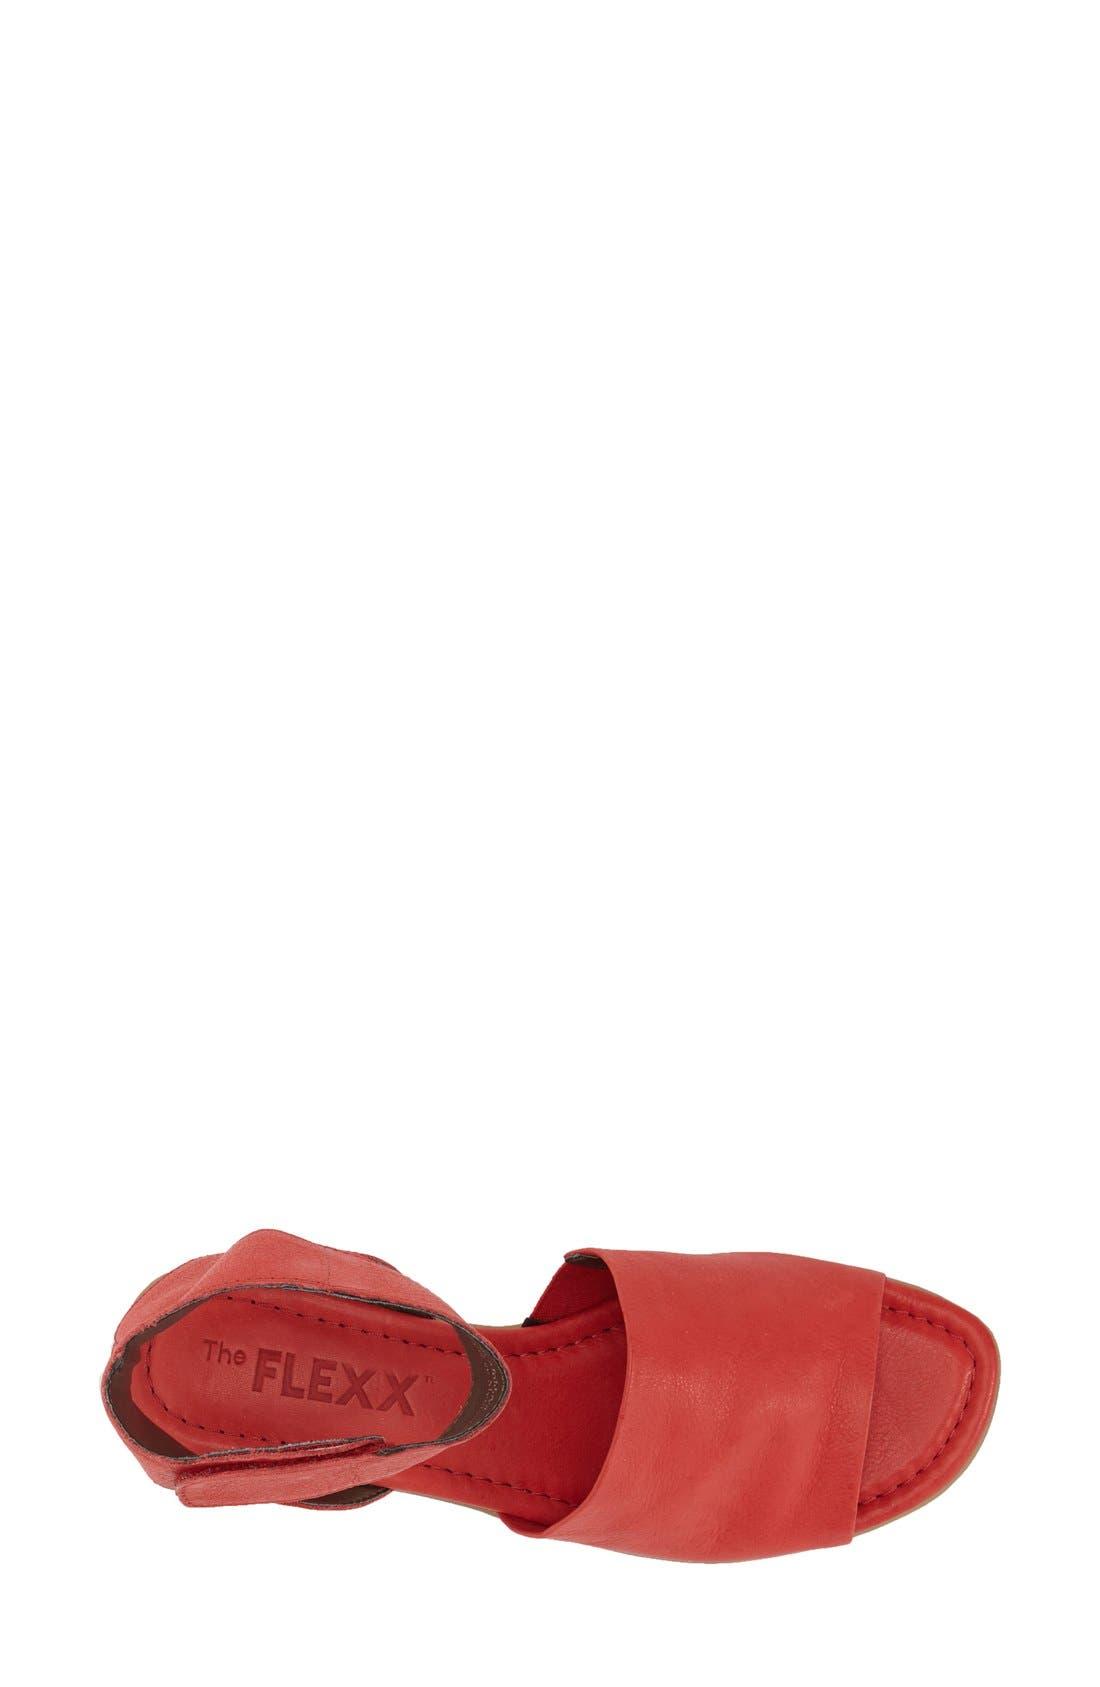 'Beglad' Leather Ankle Strap Sandal,                             Alternate thumbnail 48, color,